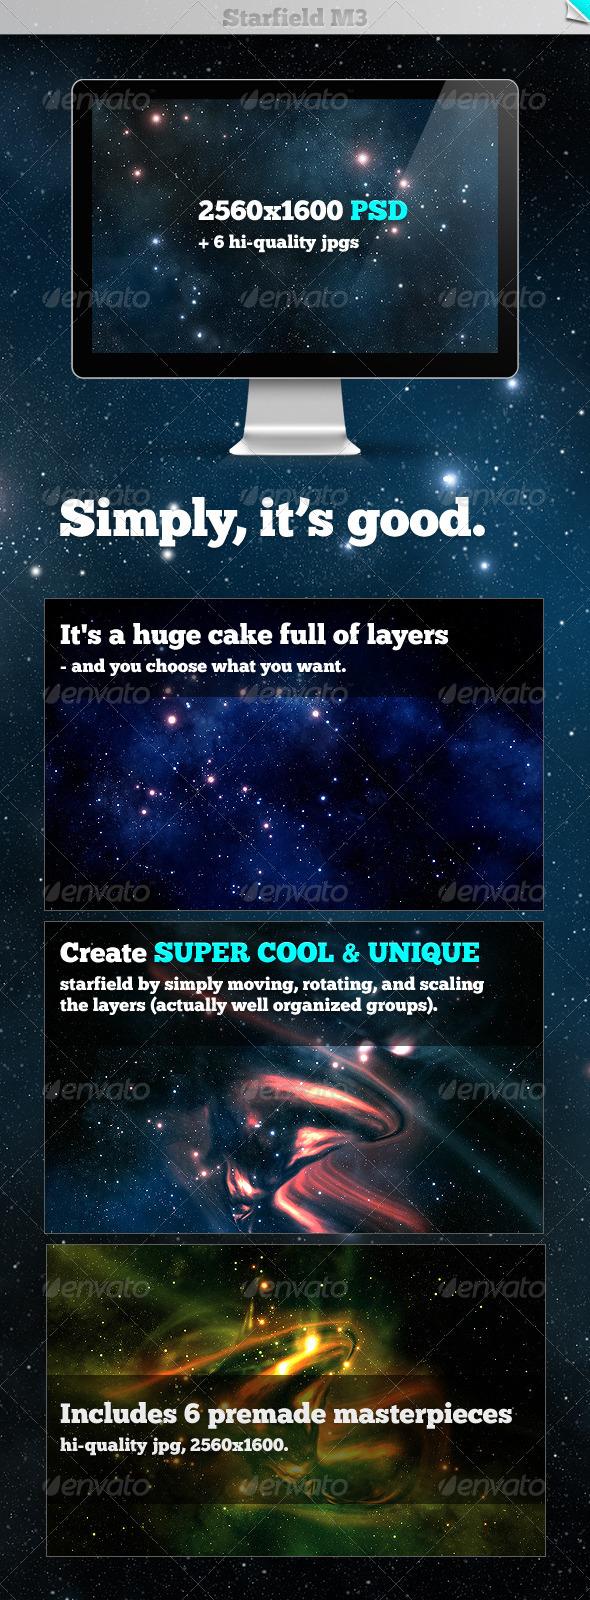 Starfield M3 - Tech / Futuristic Backgrounds